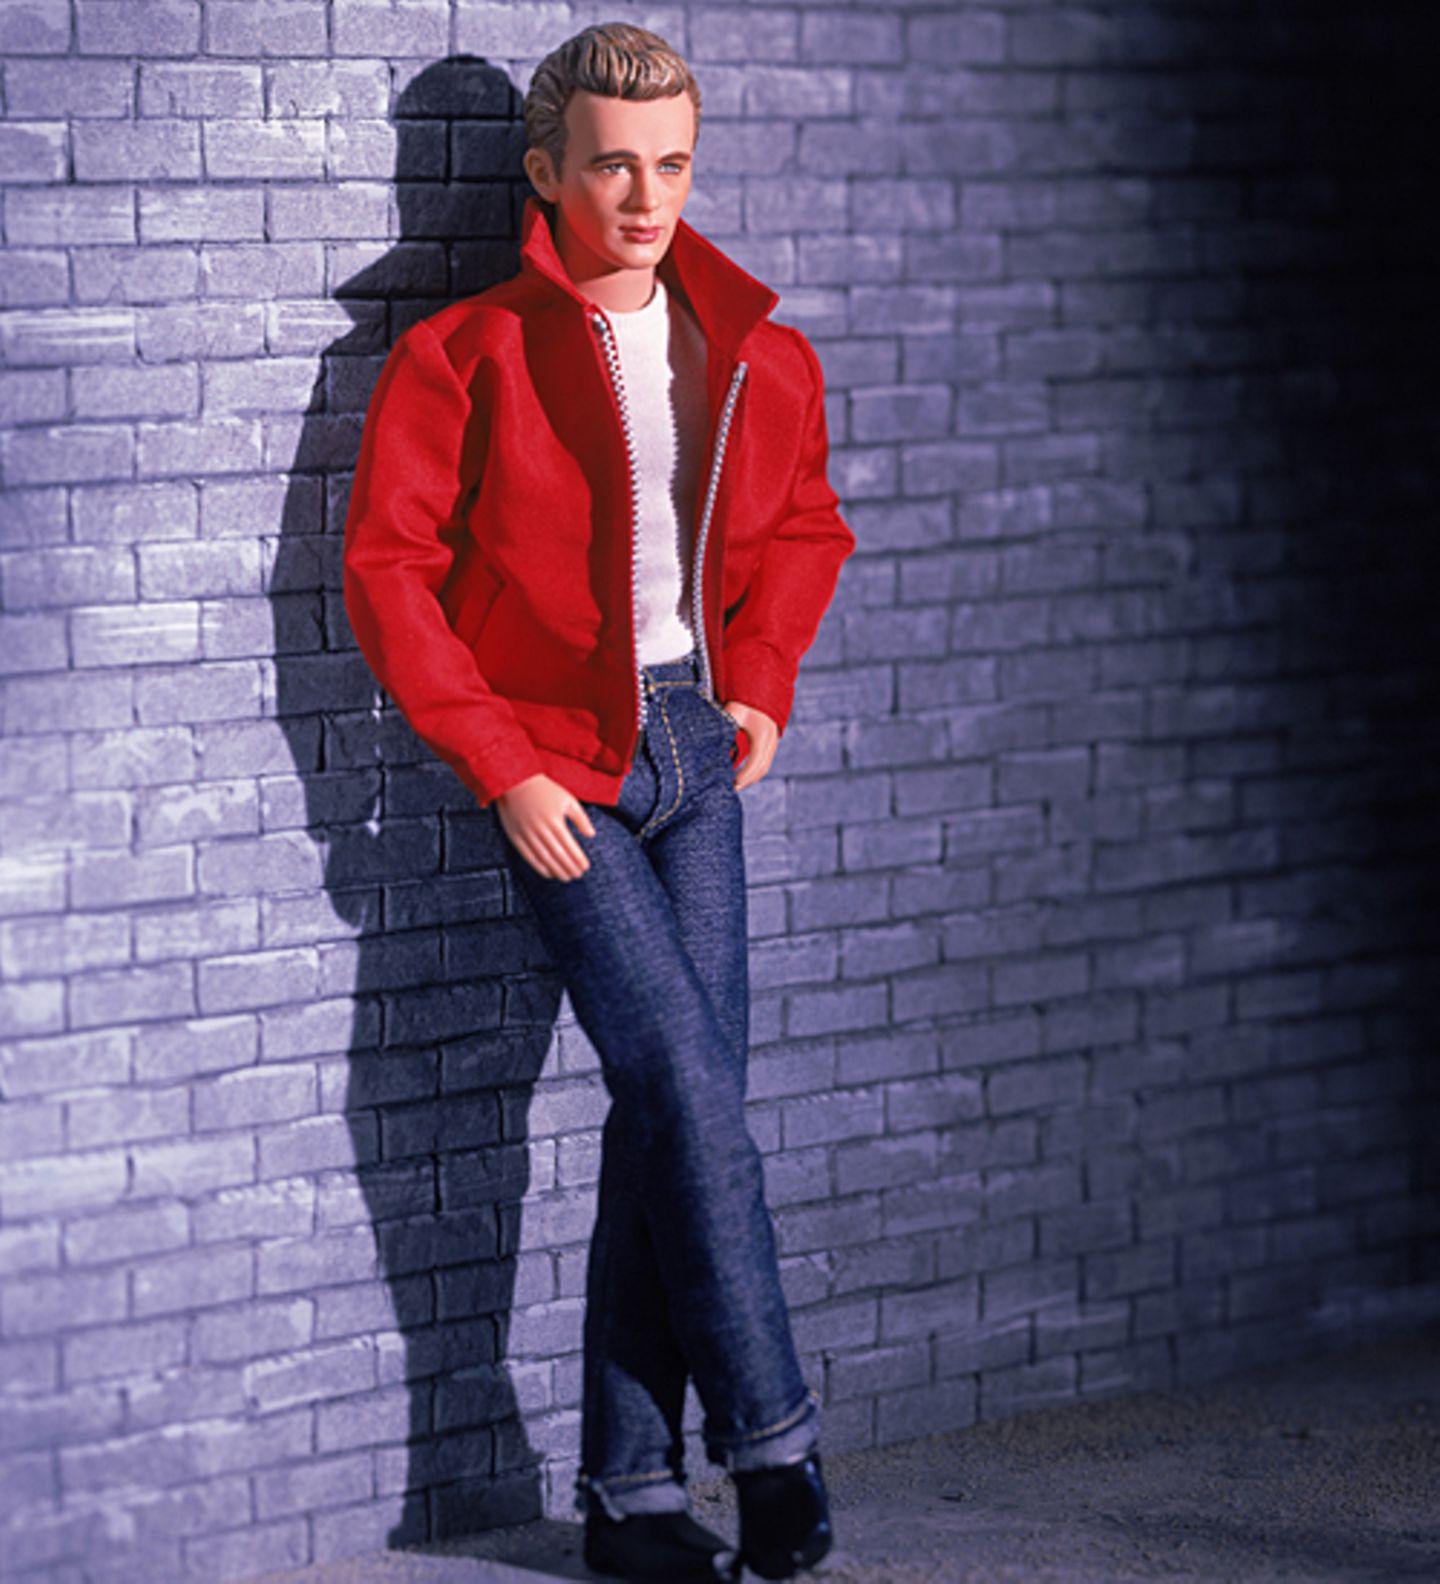 Auch Ken kann mal anders - hier ganz cool als James Dean